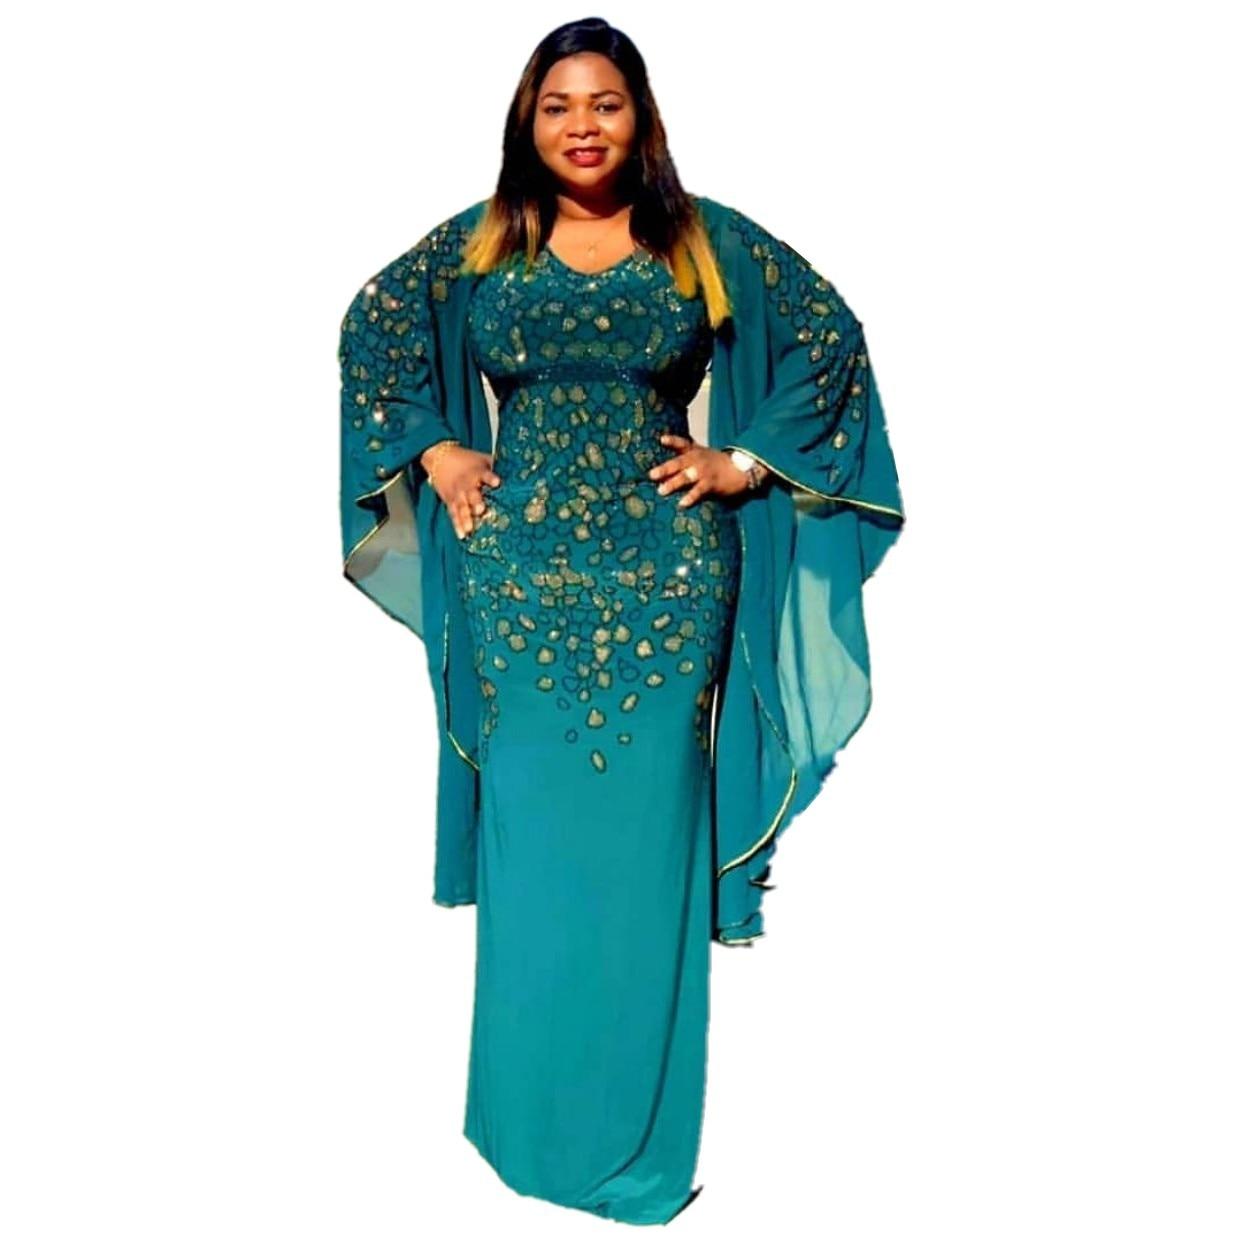 African Dresses For Women Elegant Fashion Long Dress Sexy V-Neck Beads Skinny Prom Evening Fashion Elegant Party Maxi Dress